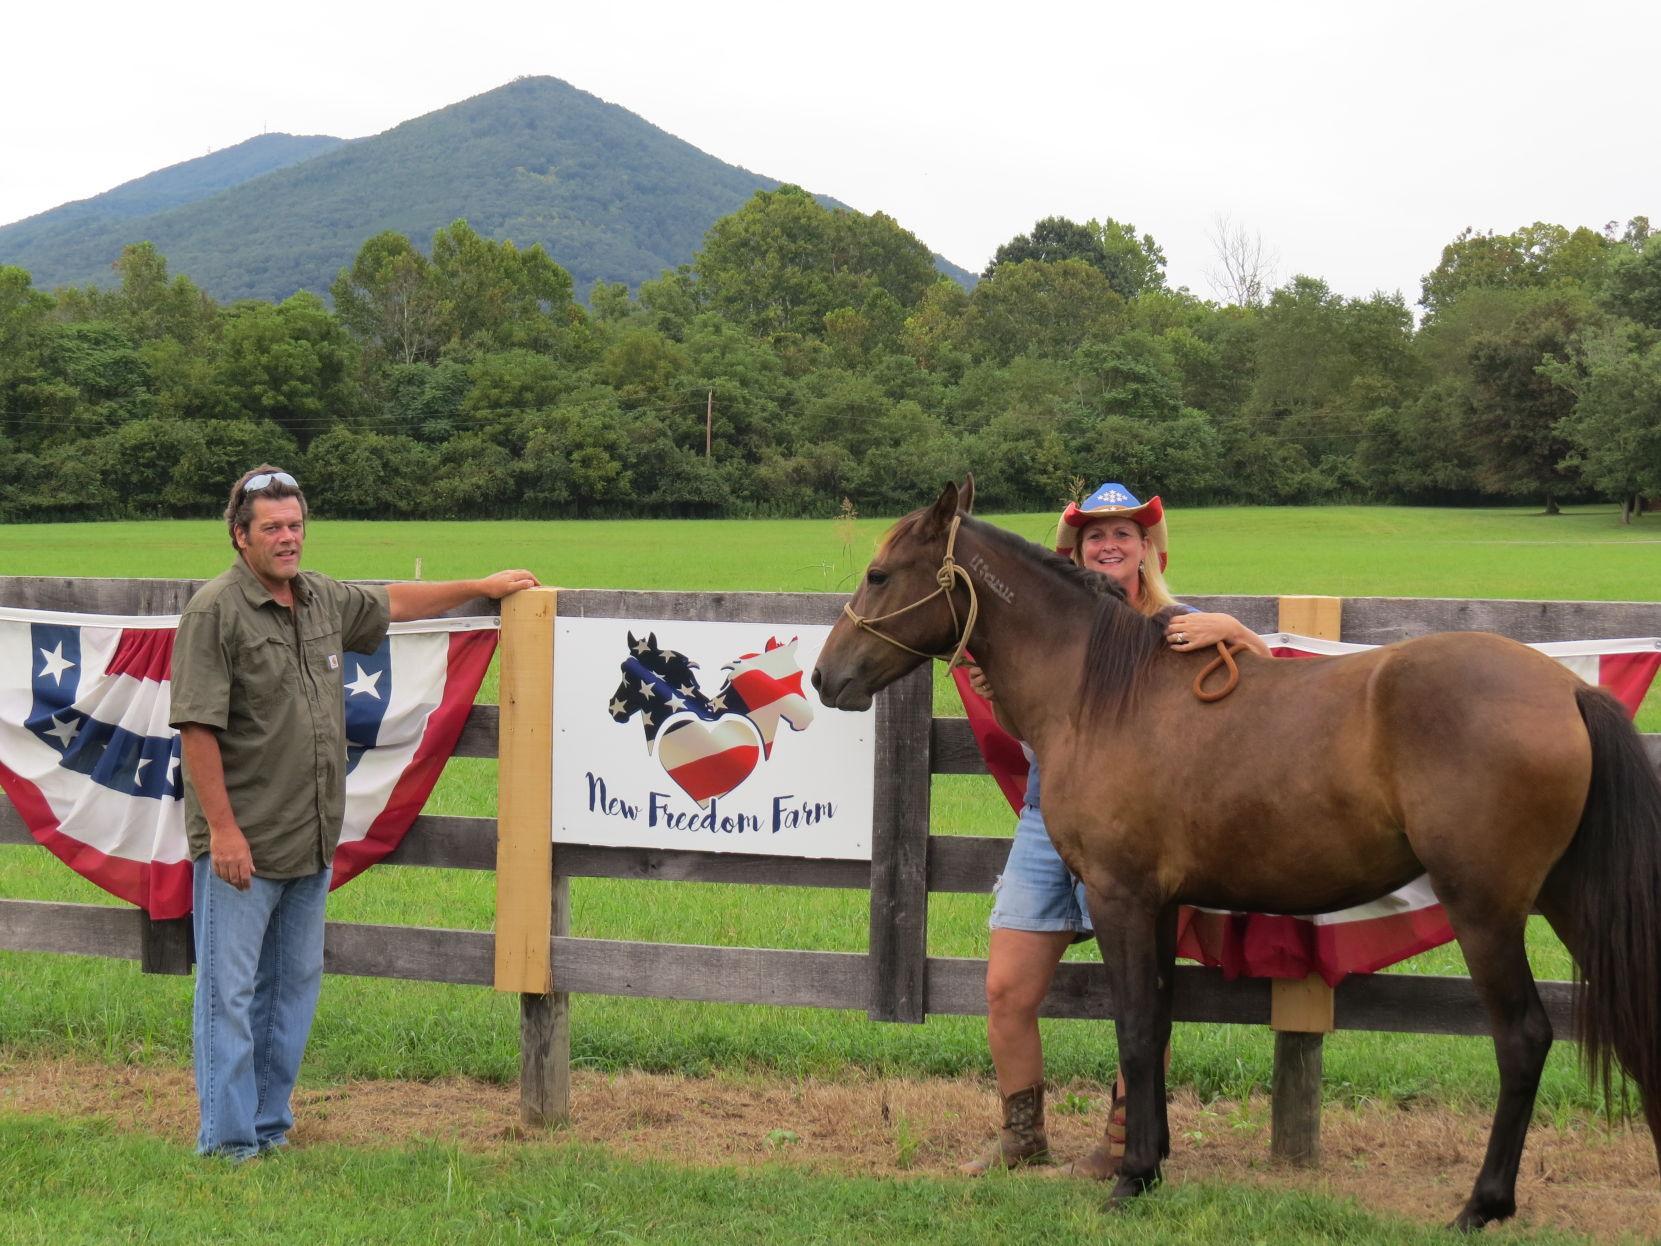 Grand Opening Of New Freedom Farm On Oct 8 Lifestyles Roanoke Com